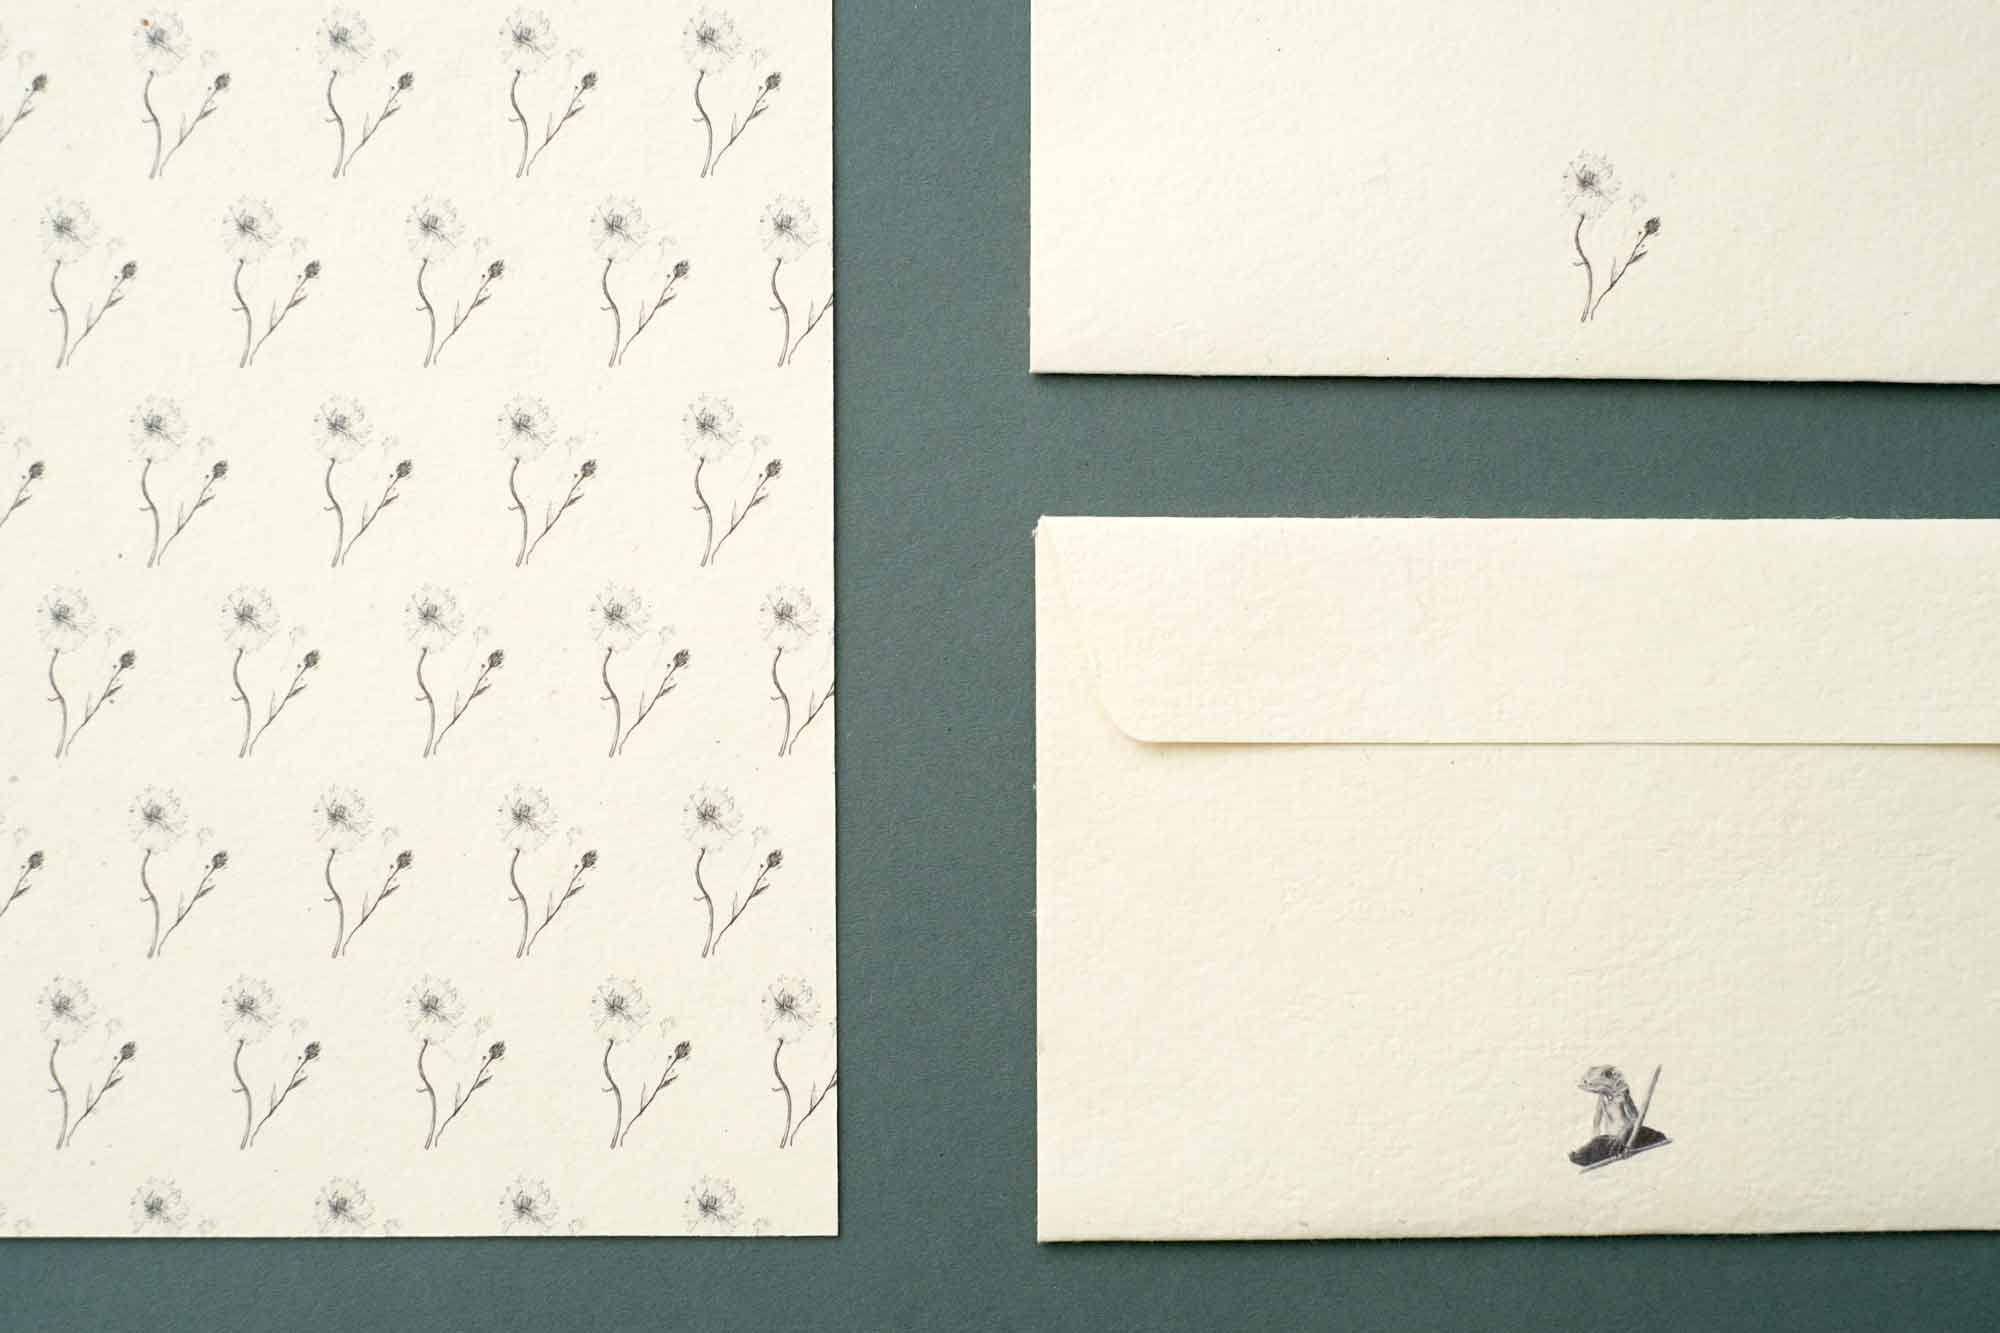 aiüo design letter and envelope natsuko mizushima van der ree